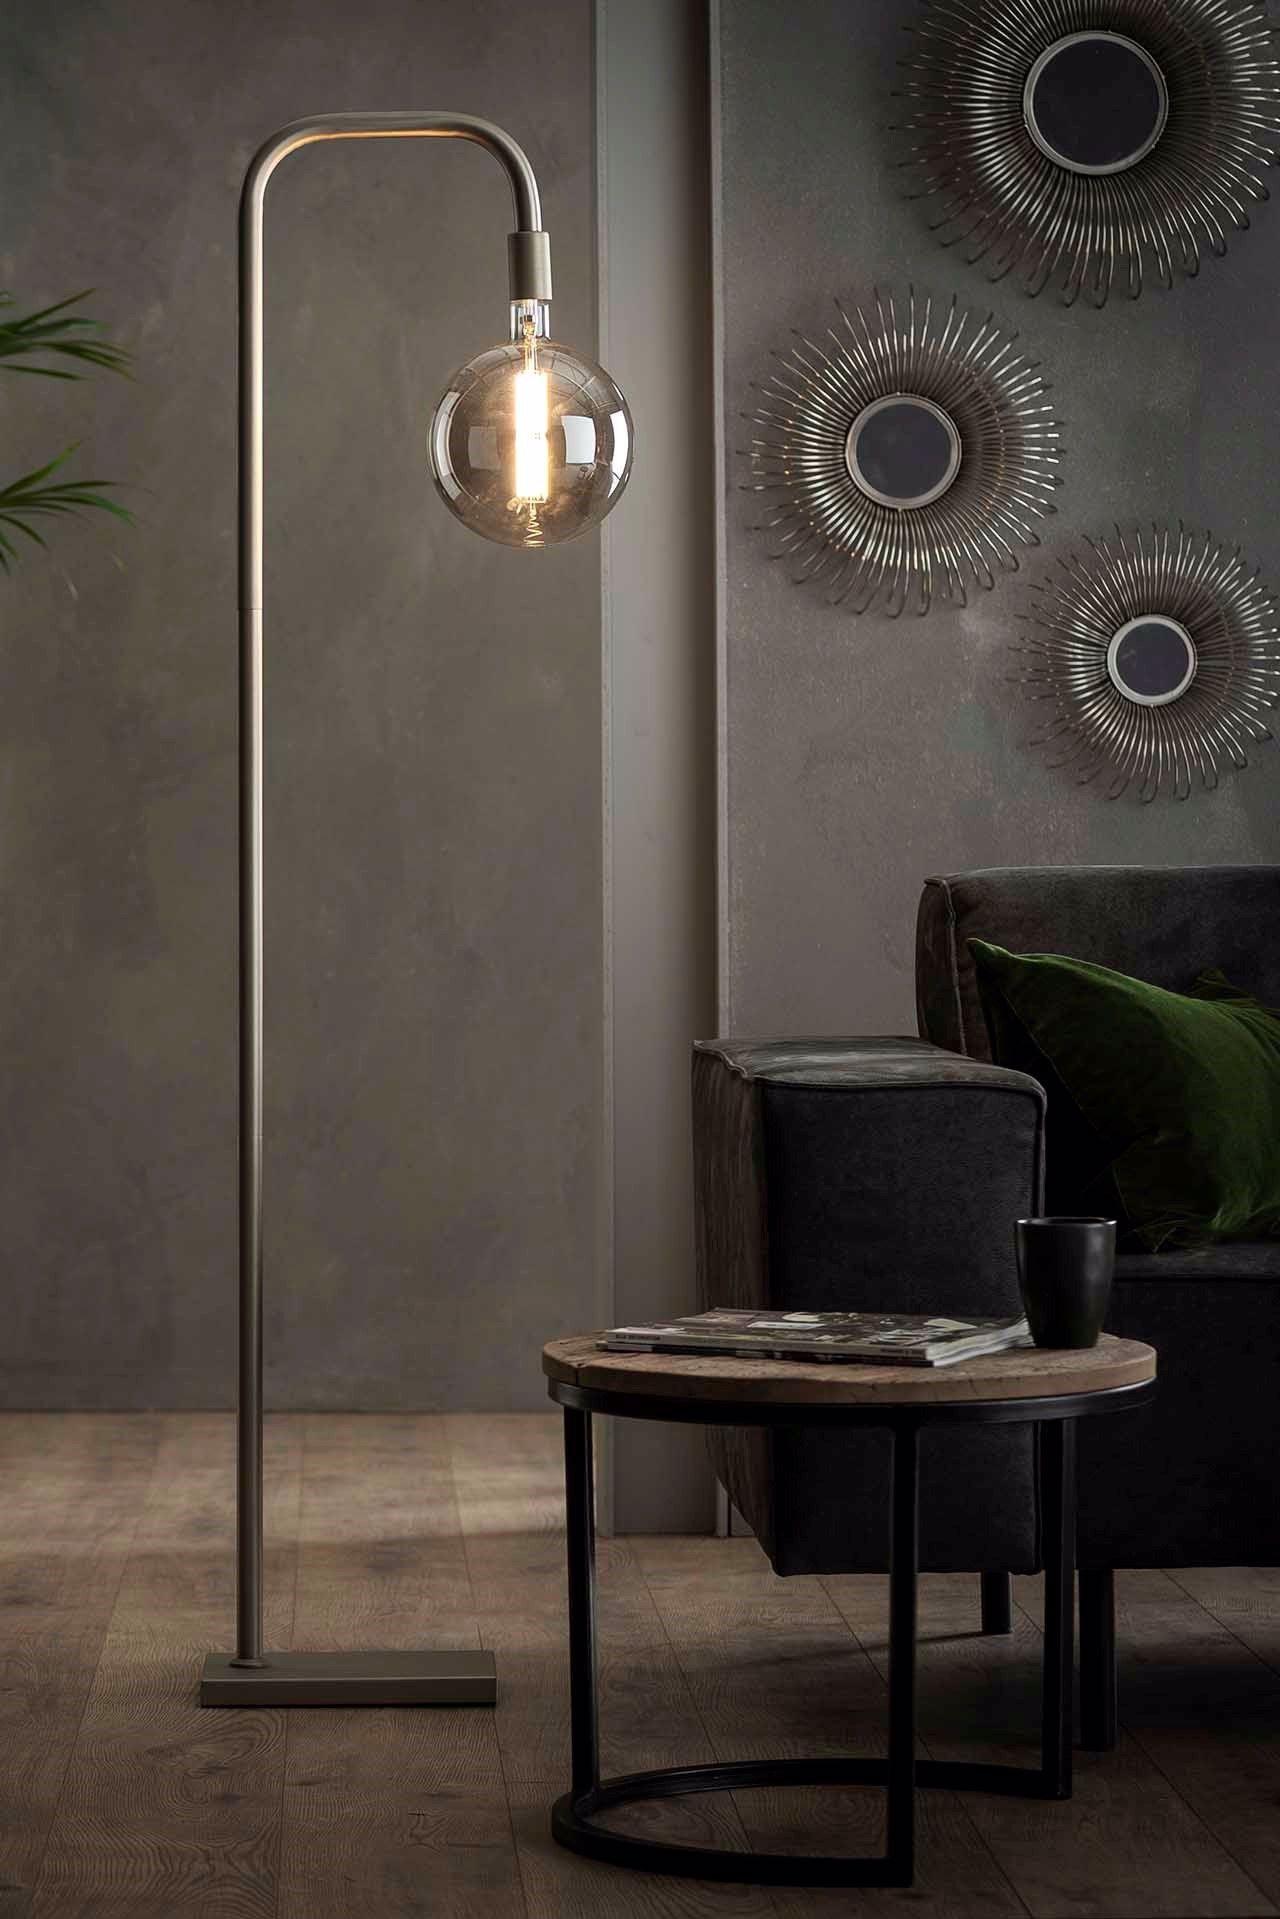 Pin By Salvador Roberts On Life In 2020 Industrial Floor Lamps Lamp Floor Lamp